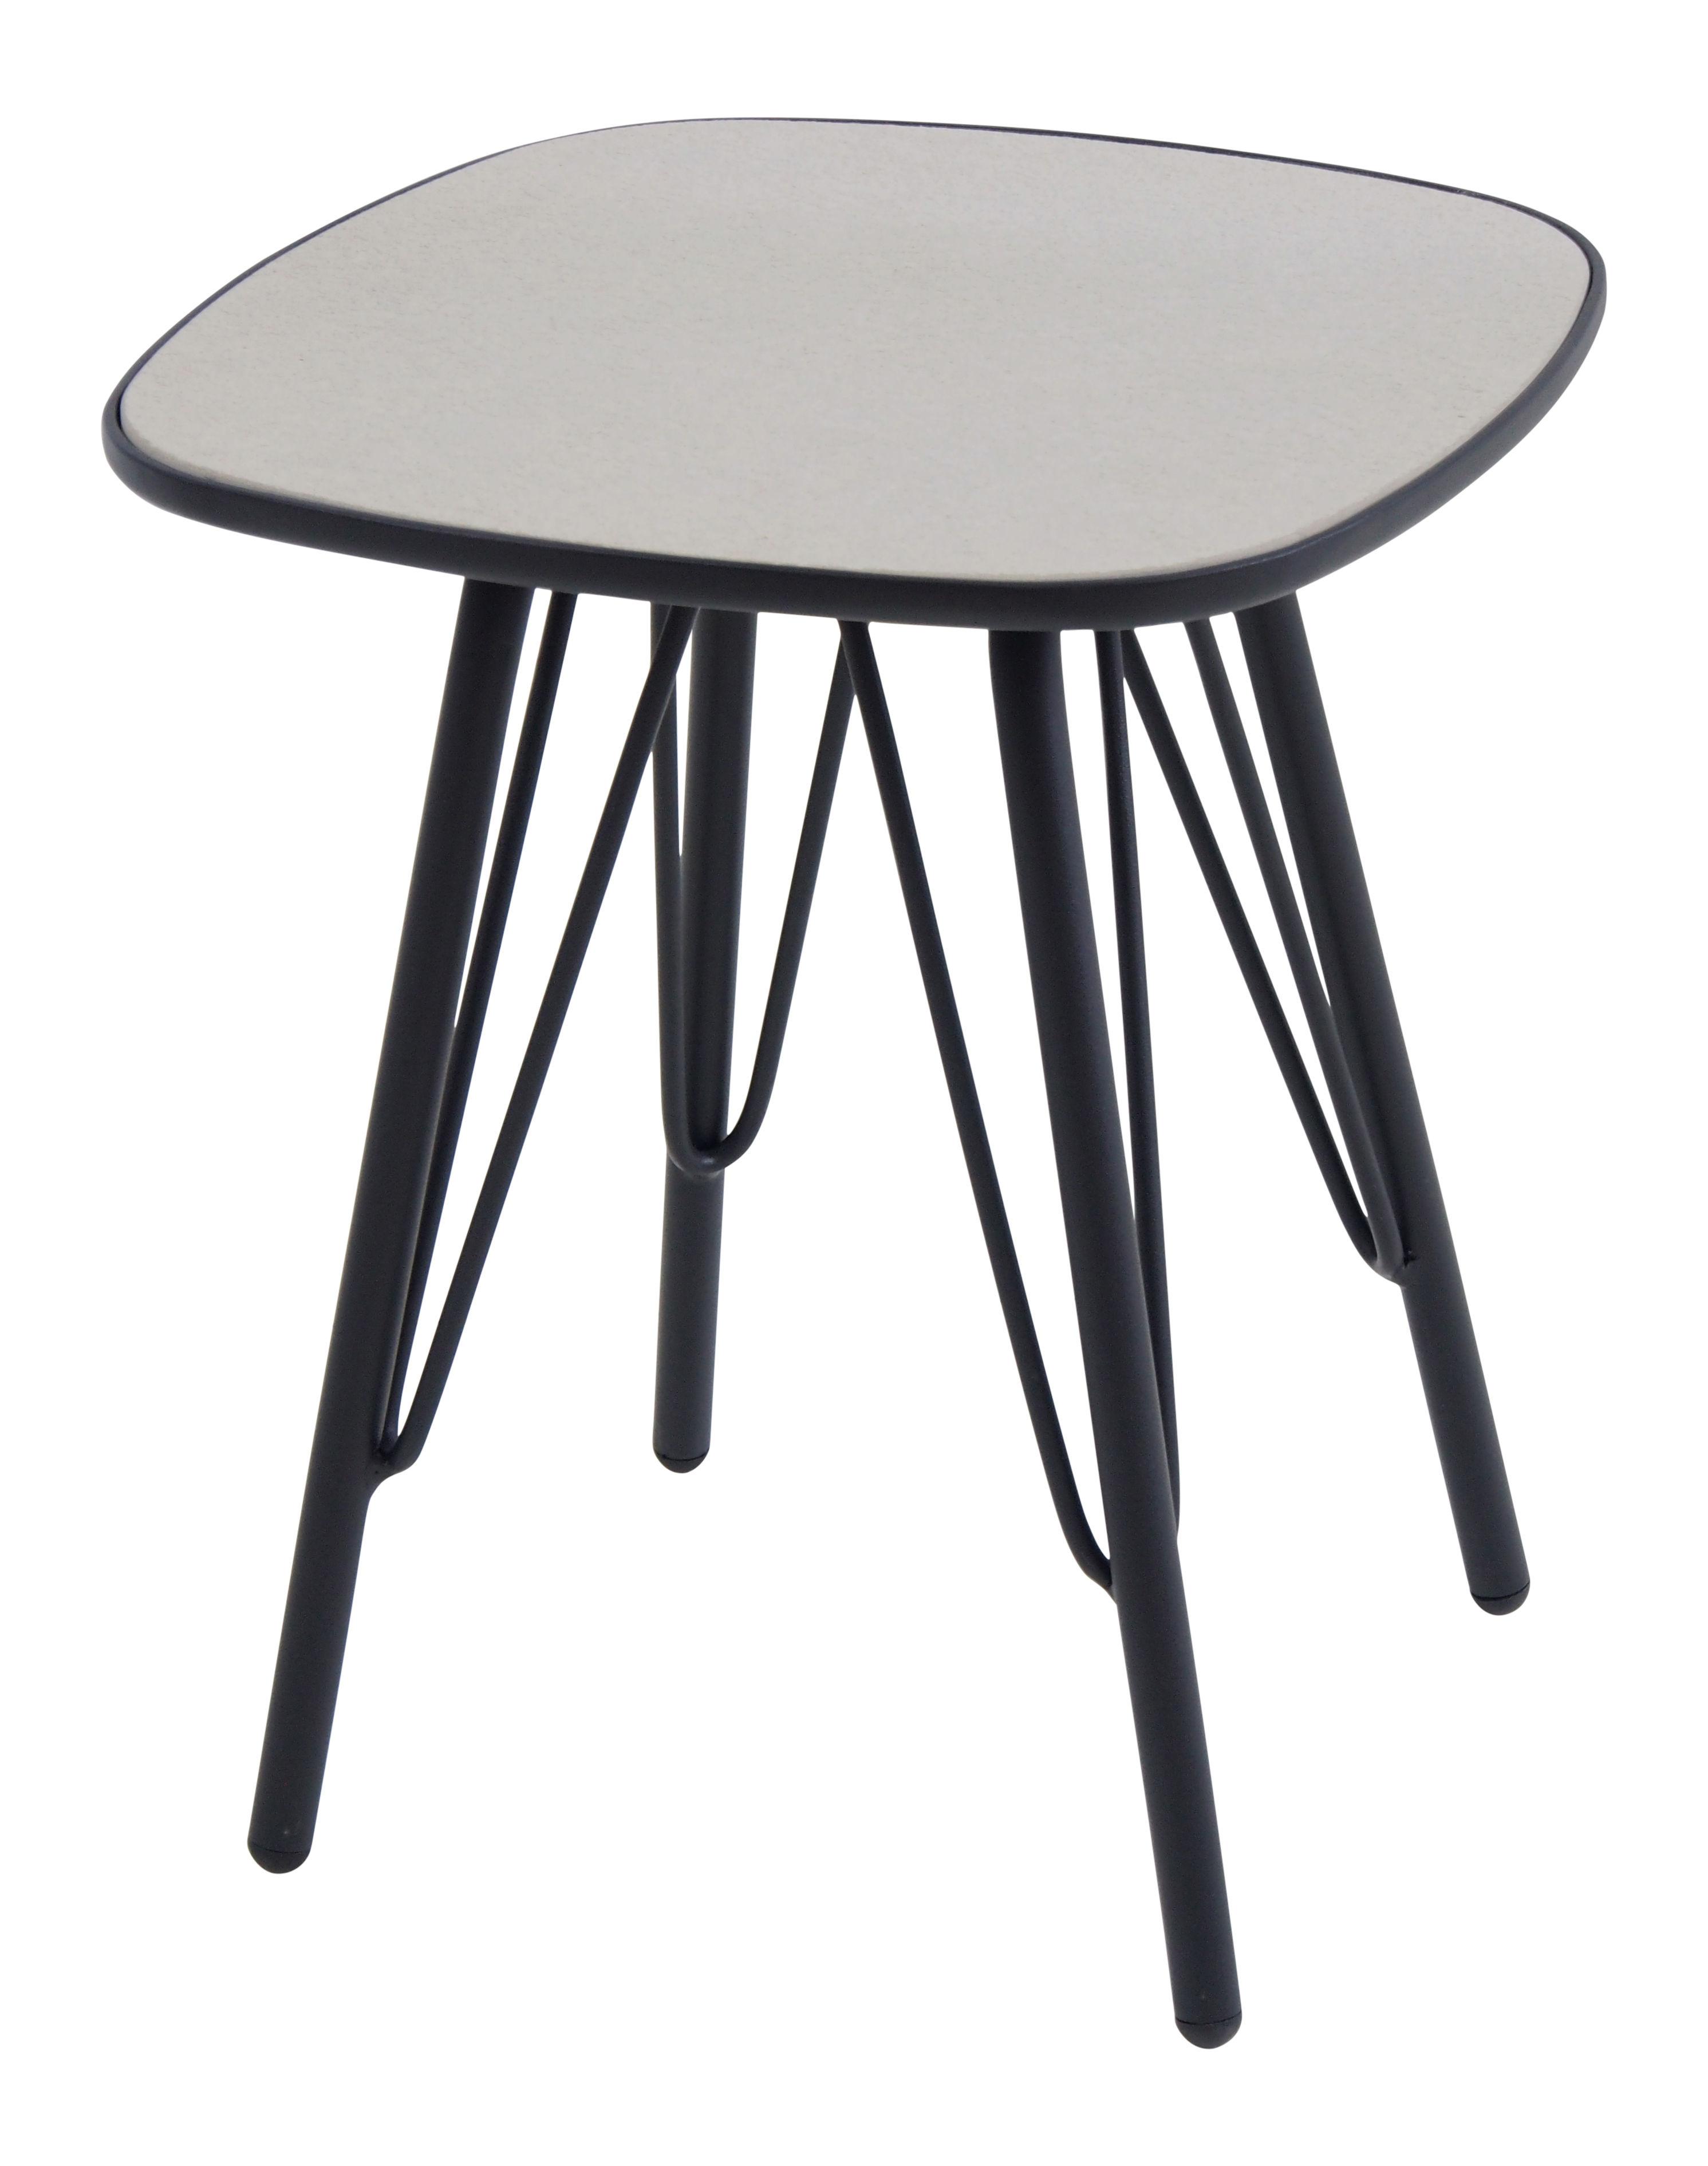 Furniture - Coffee Tables - Lyze End table - 40 x 40 cm by Emu - Light grey top / Black leg - Varnished aluminium